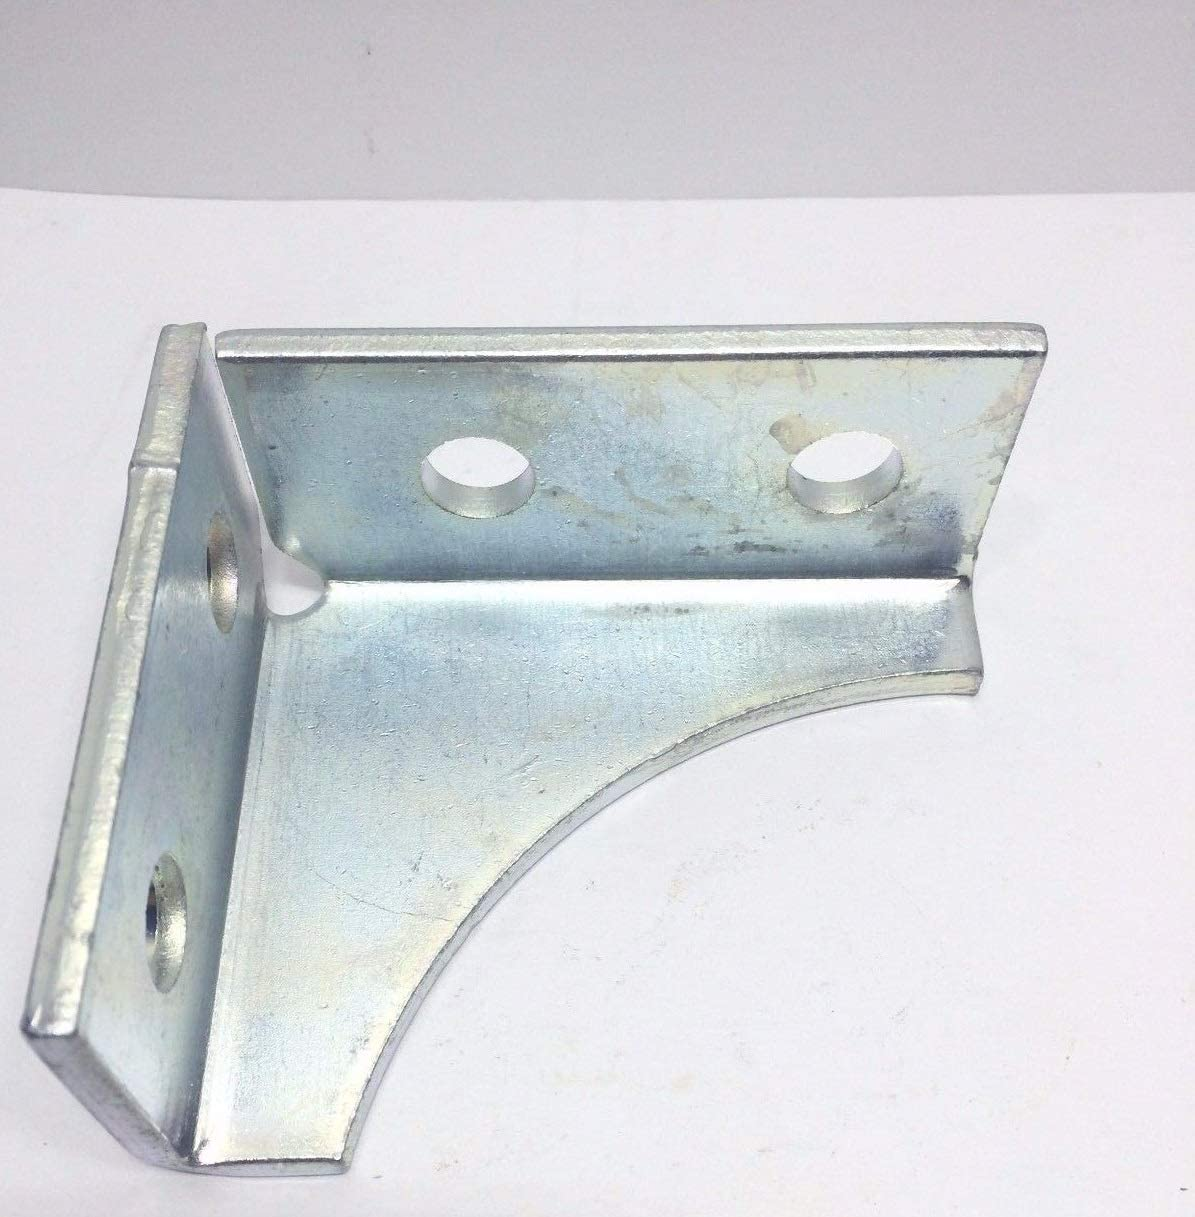 2013-2018 Polaris Scrambler 1000 2-Piece Full Frame Aluminum Skid Plate By Ricochet 769